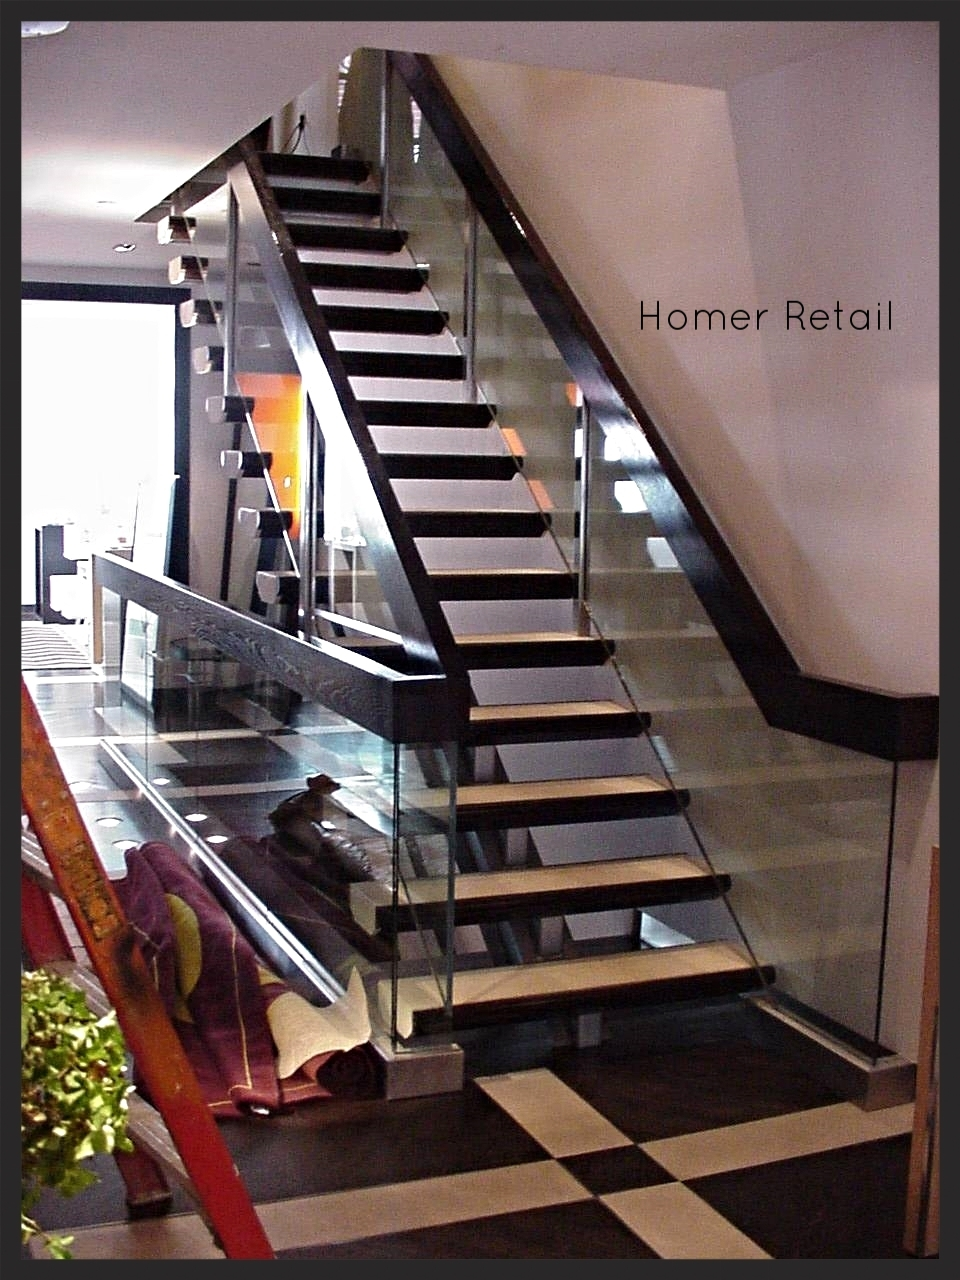 Homer Retail